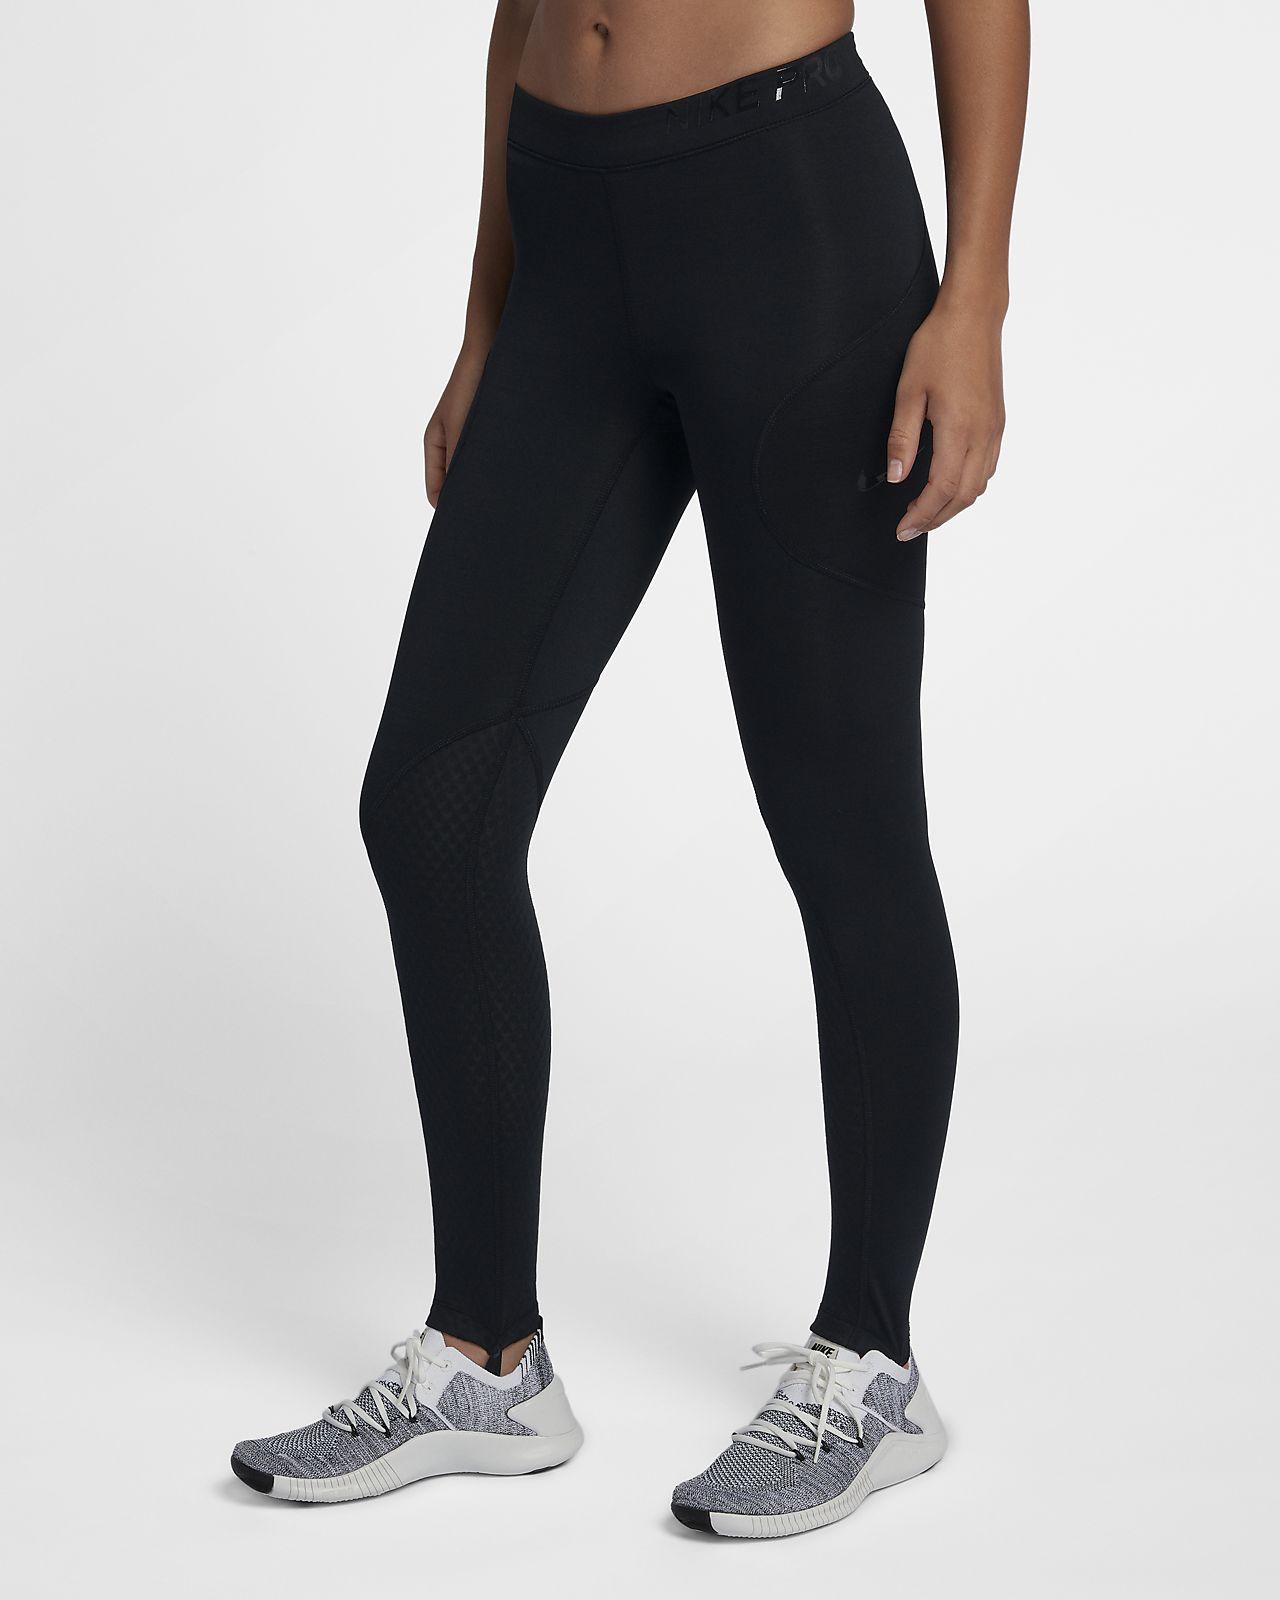 Nike Pro HyperWarm Women's Leggings